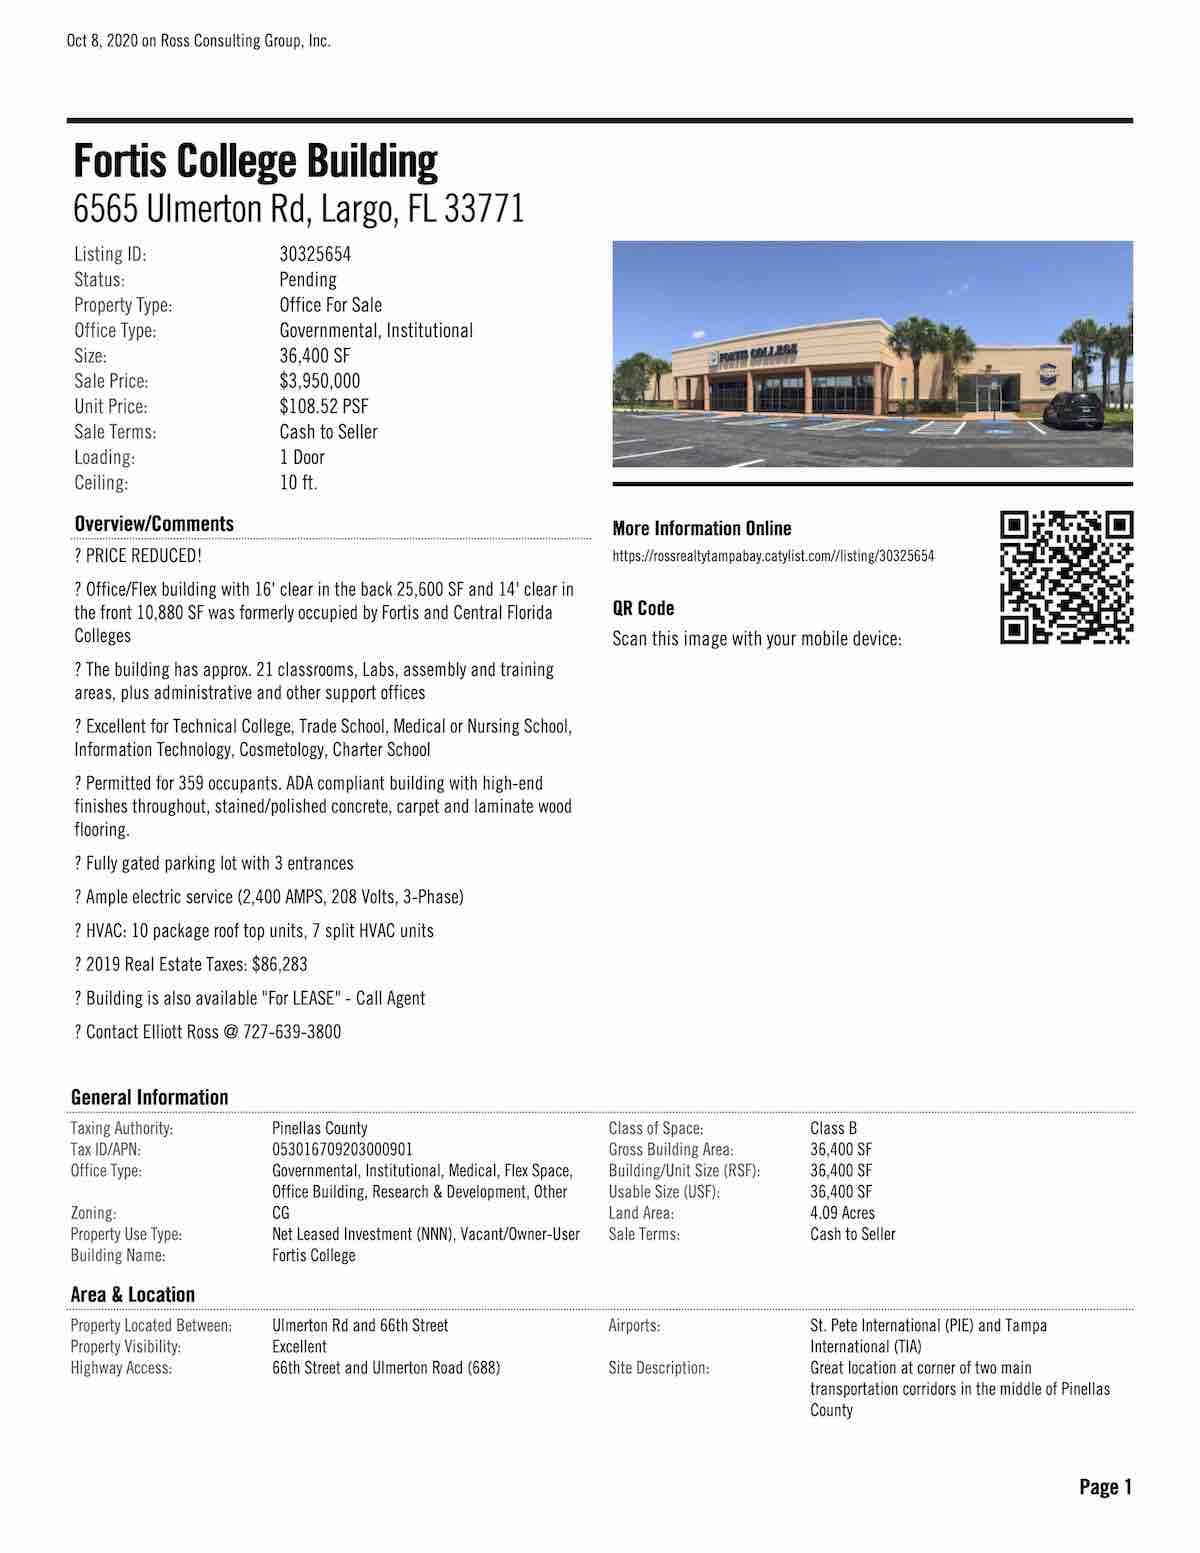 FOR SALE - Fortis College Building - 6565 Ulmerton Rd, Largo, FL 33771 P1